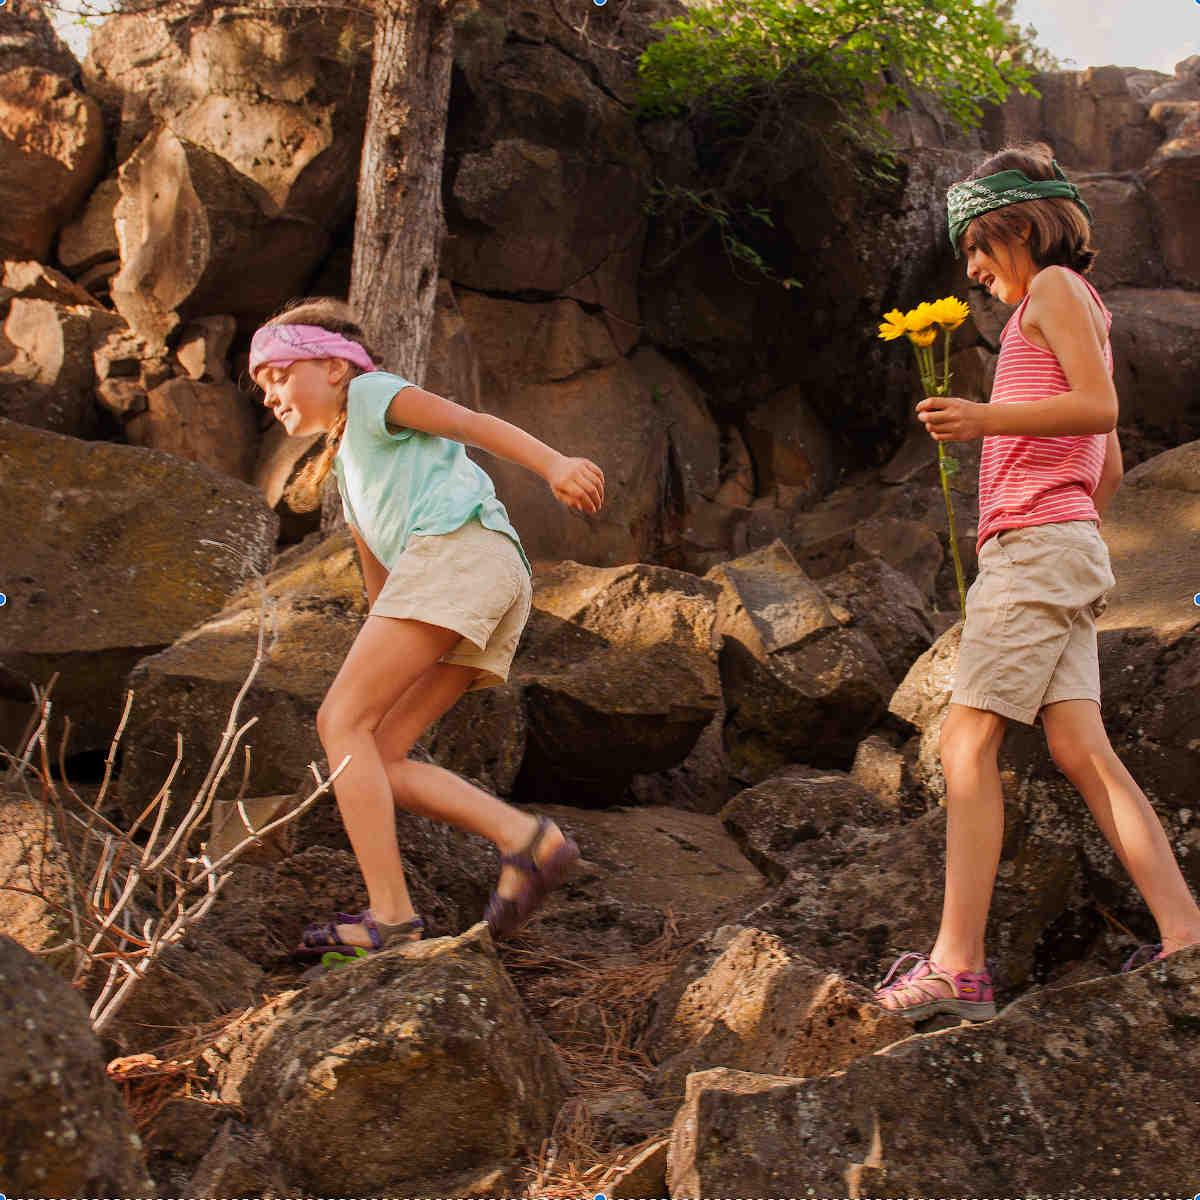 Two young girls walking among the Juniper Trees